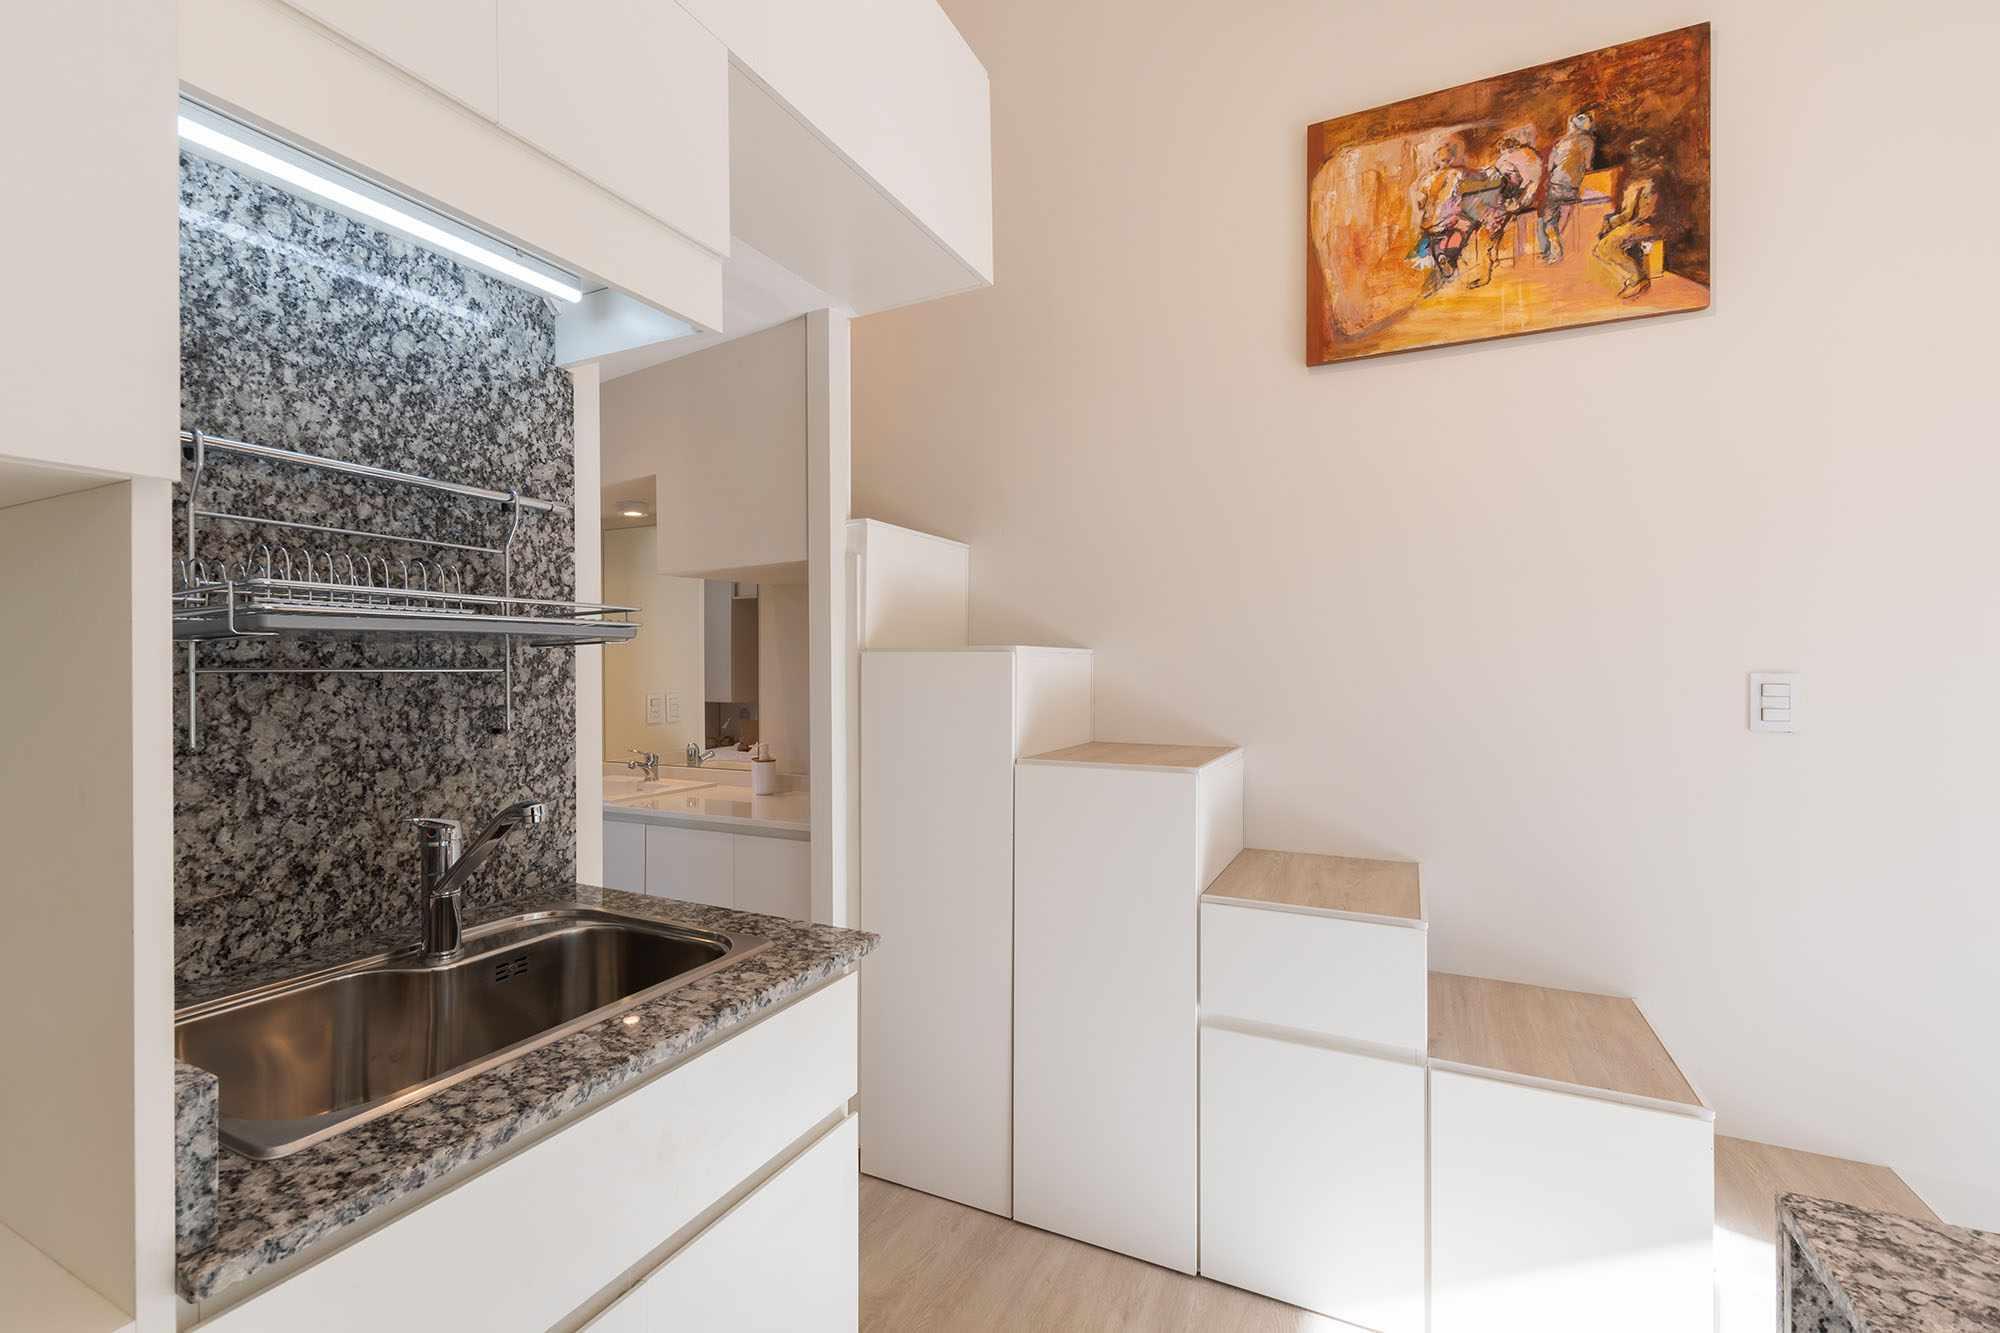 Hüga prefabricated house by Grandio kitchen